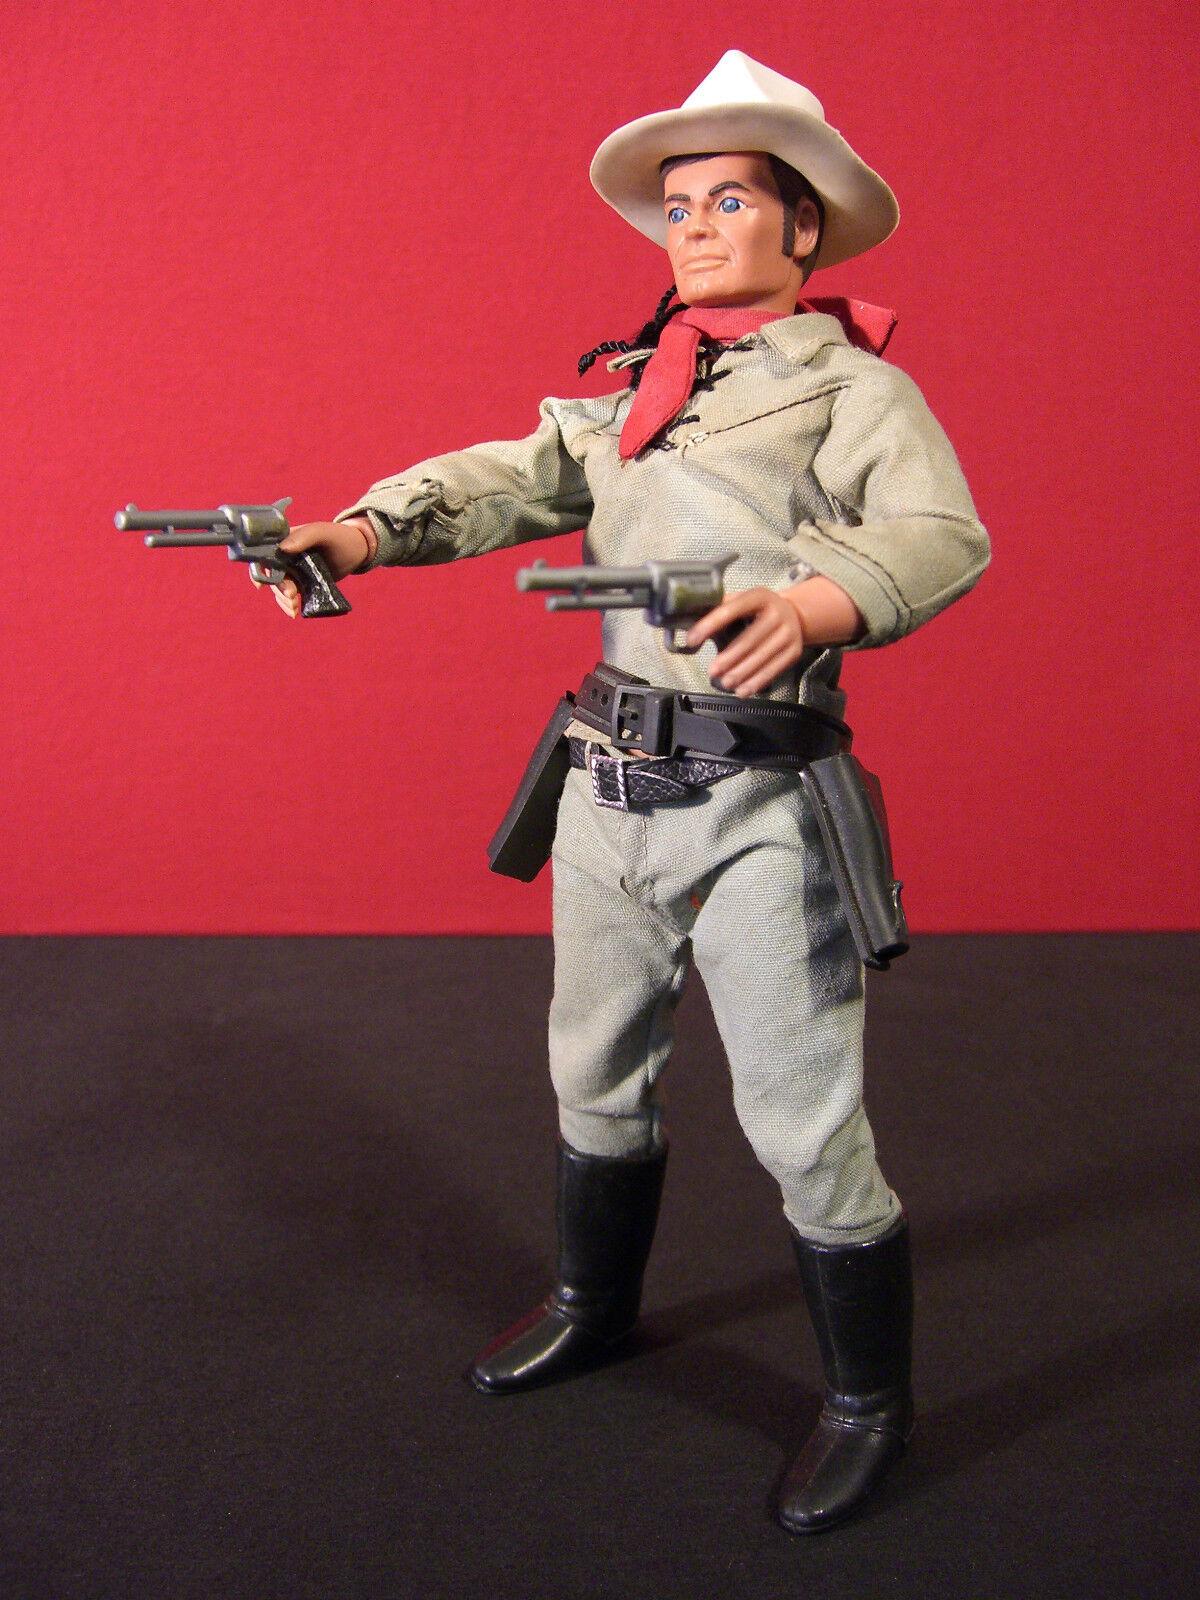 Lone Ranger Vintage 1973 Loose Gabriel Action Figure